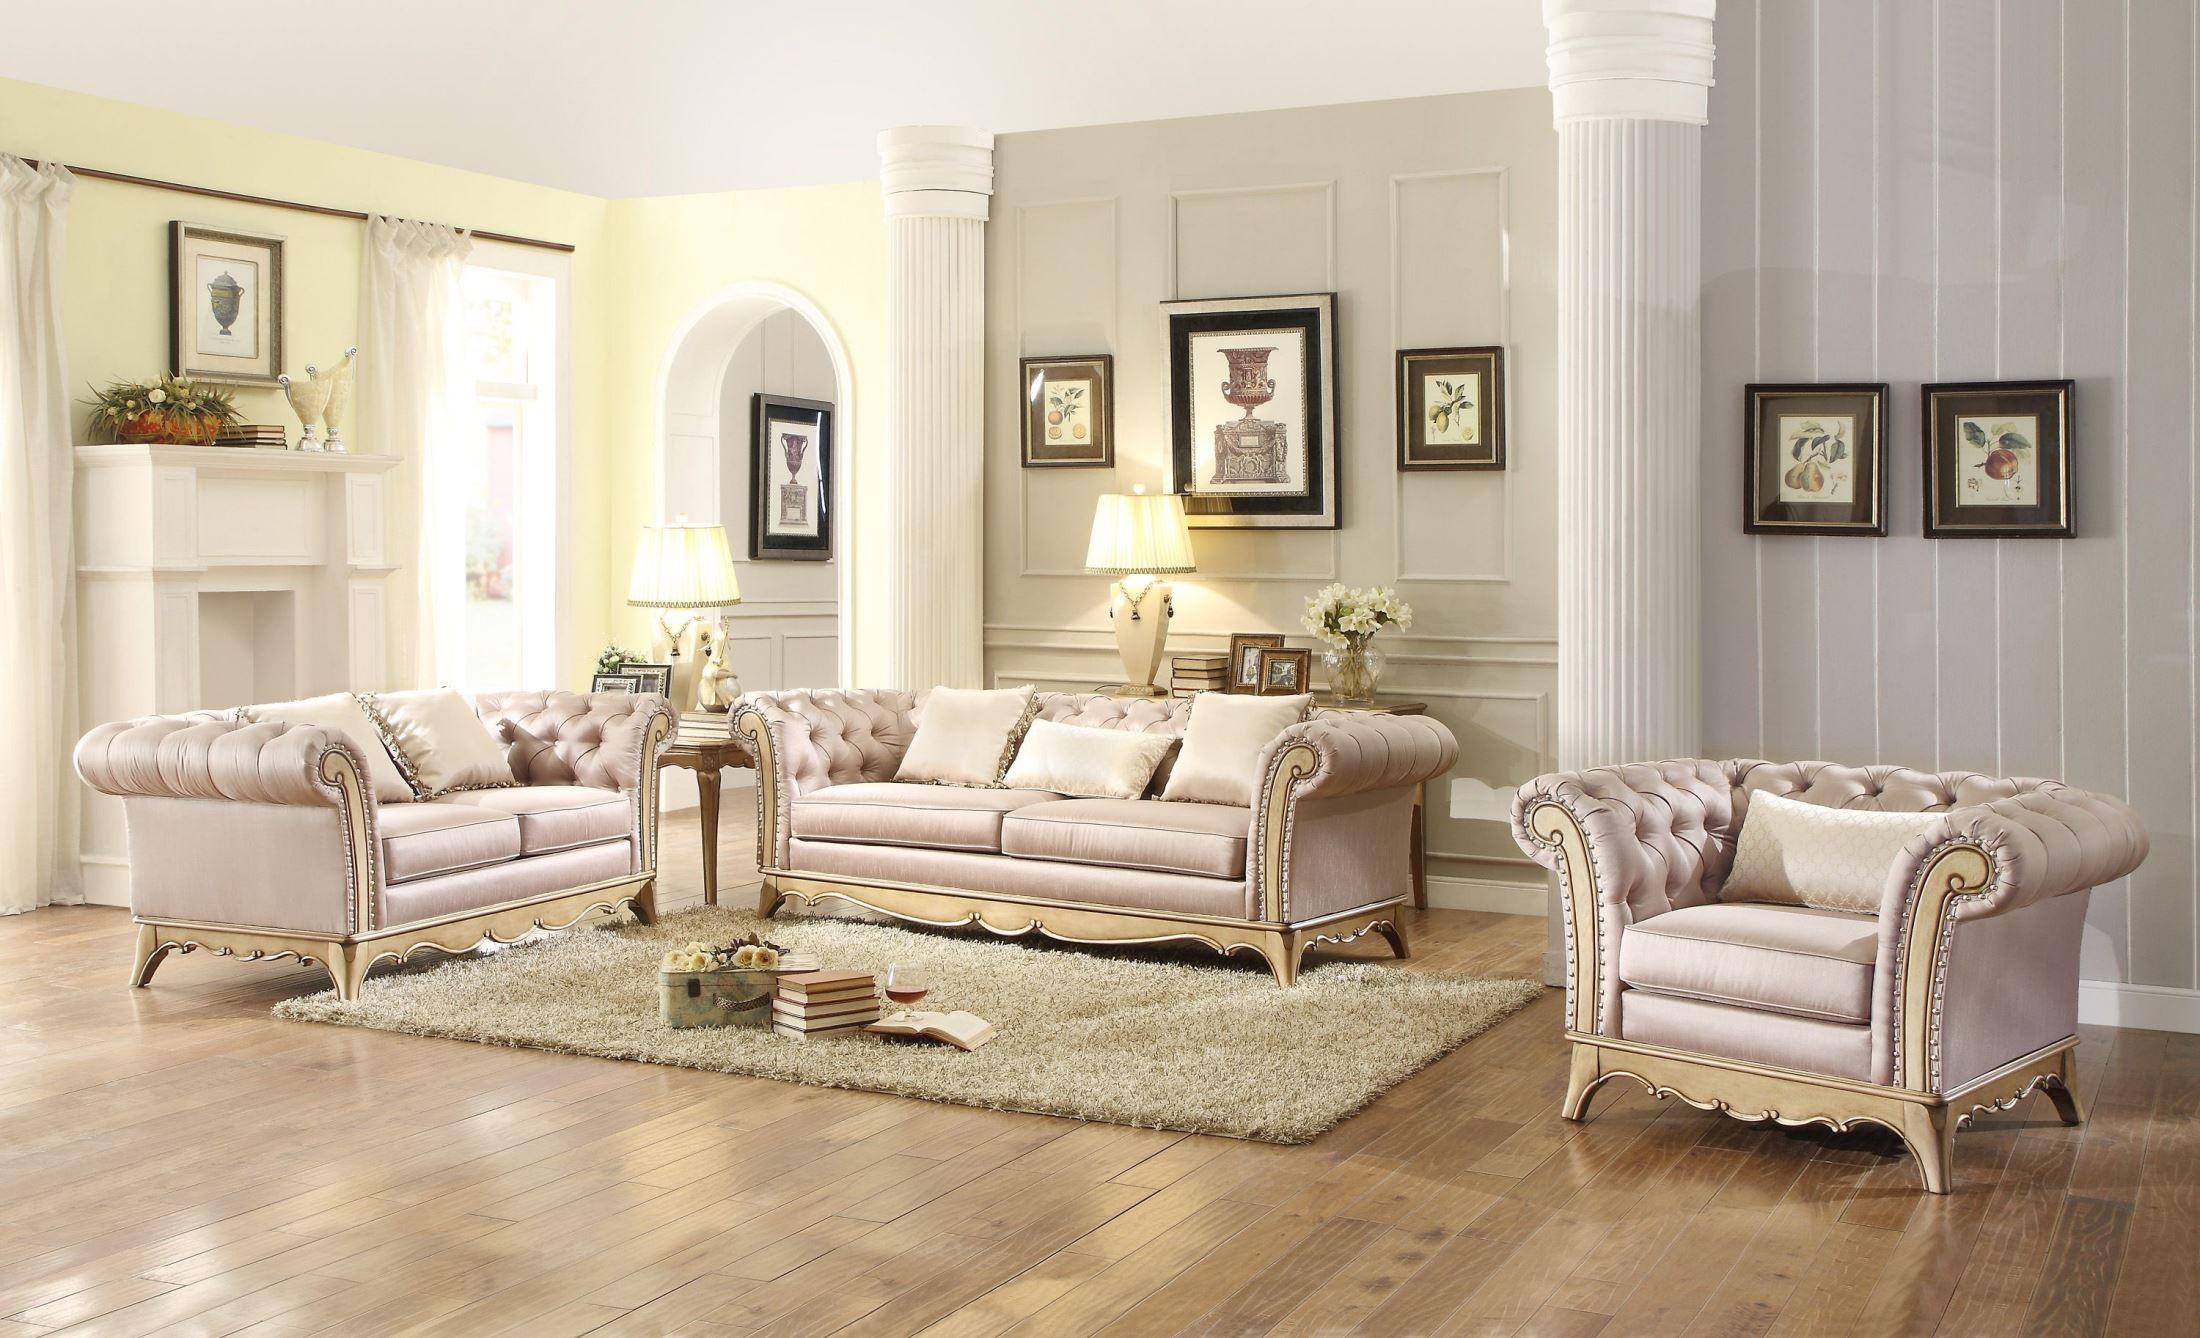 Chambord Champagne Gold Living Room Set from Homelegance (18289-3 ...